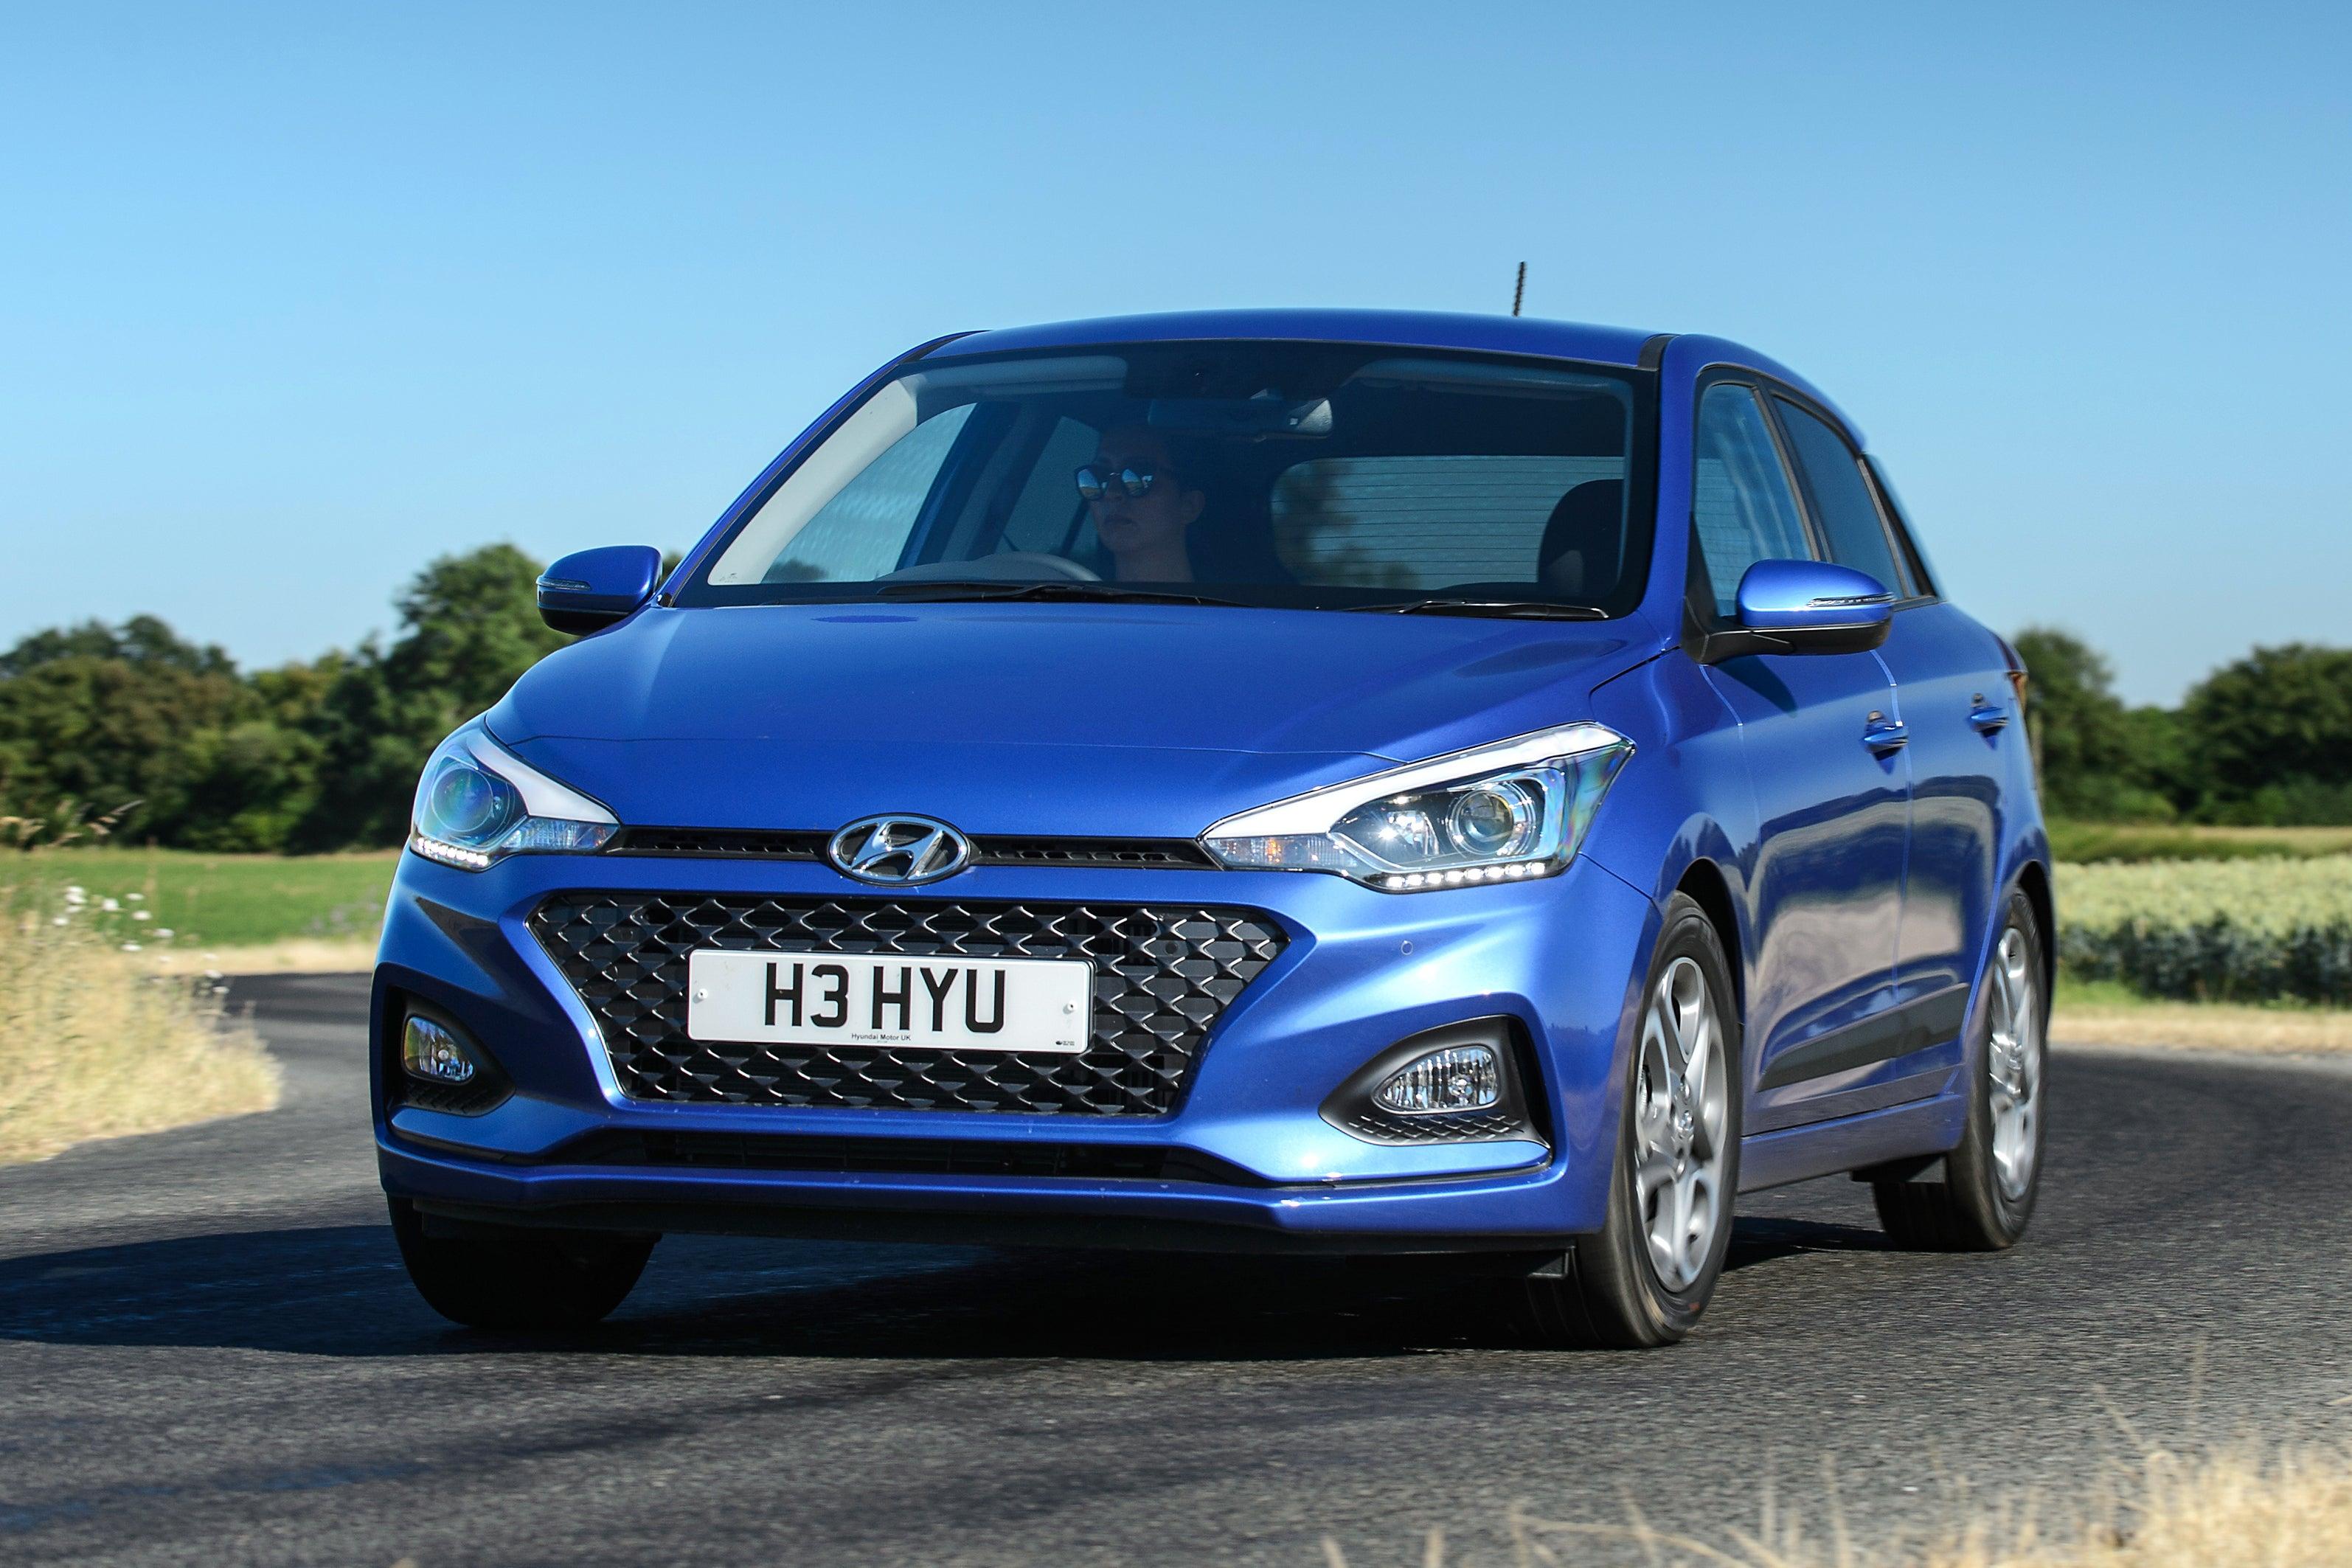 Hyundai i20 2015 frontleft exterior